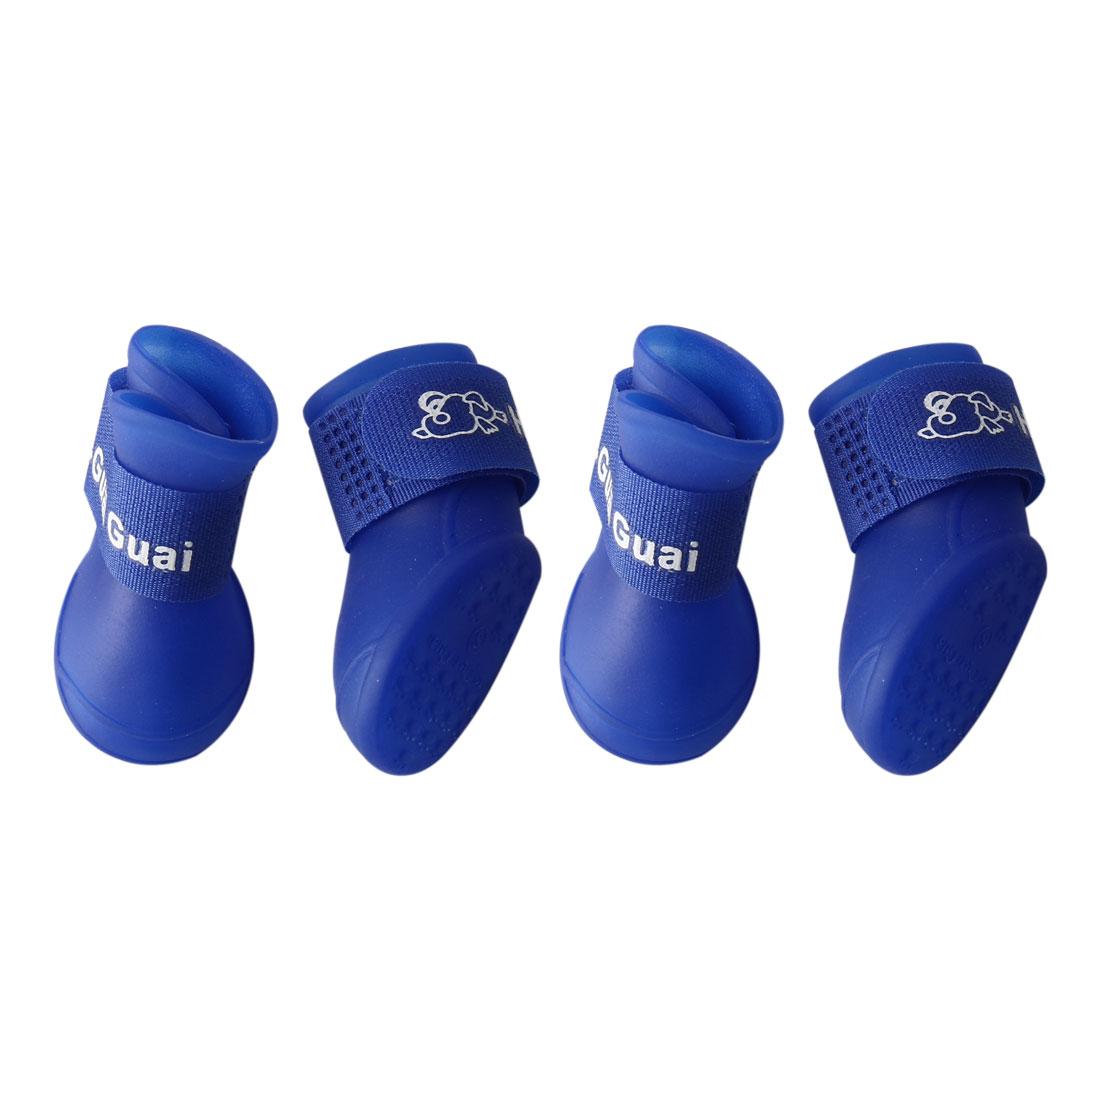 Dog Rain Shoes Pet Boots Water Resistant for Dog Paw Protectors Blue 4pcs, M